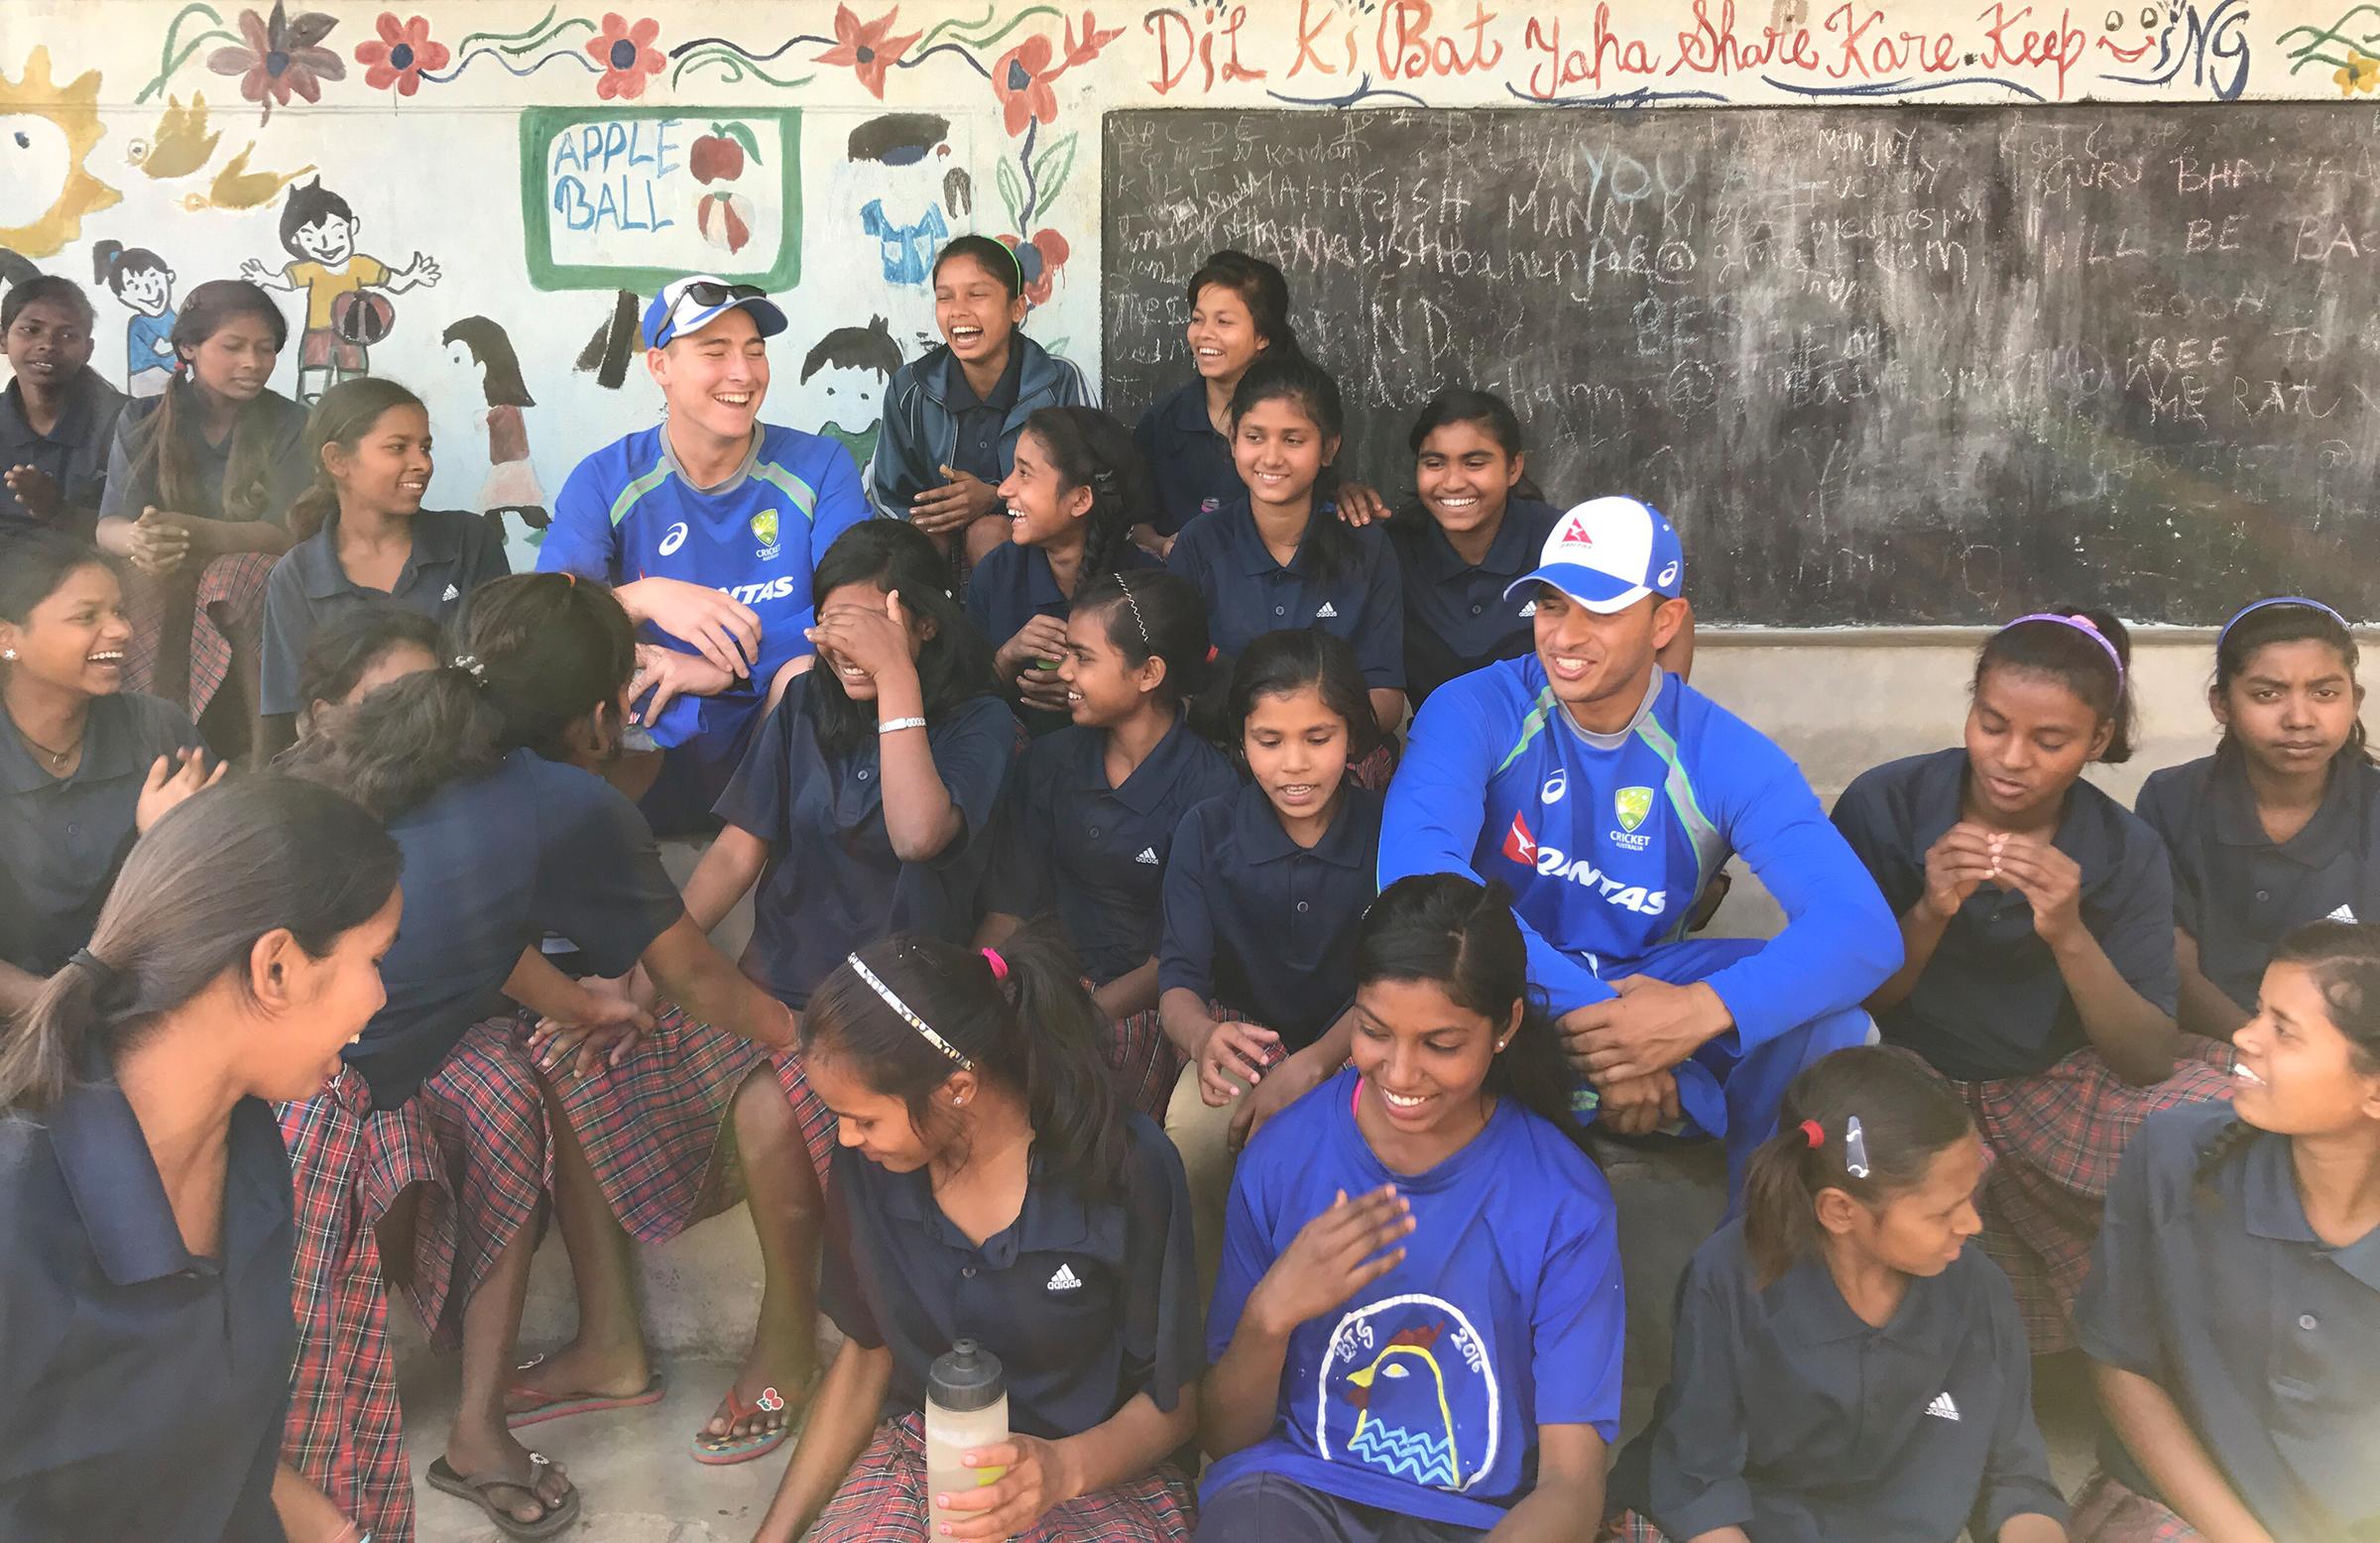 Matt Renshaw and Usman Khawaja meets with the Yuwa girls // cricket.com.au